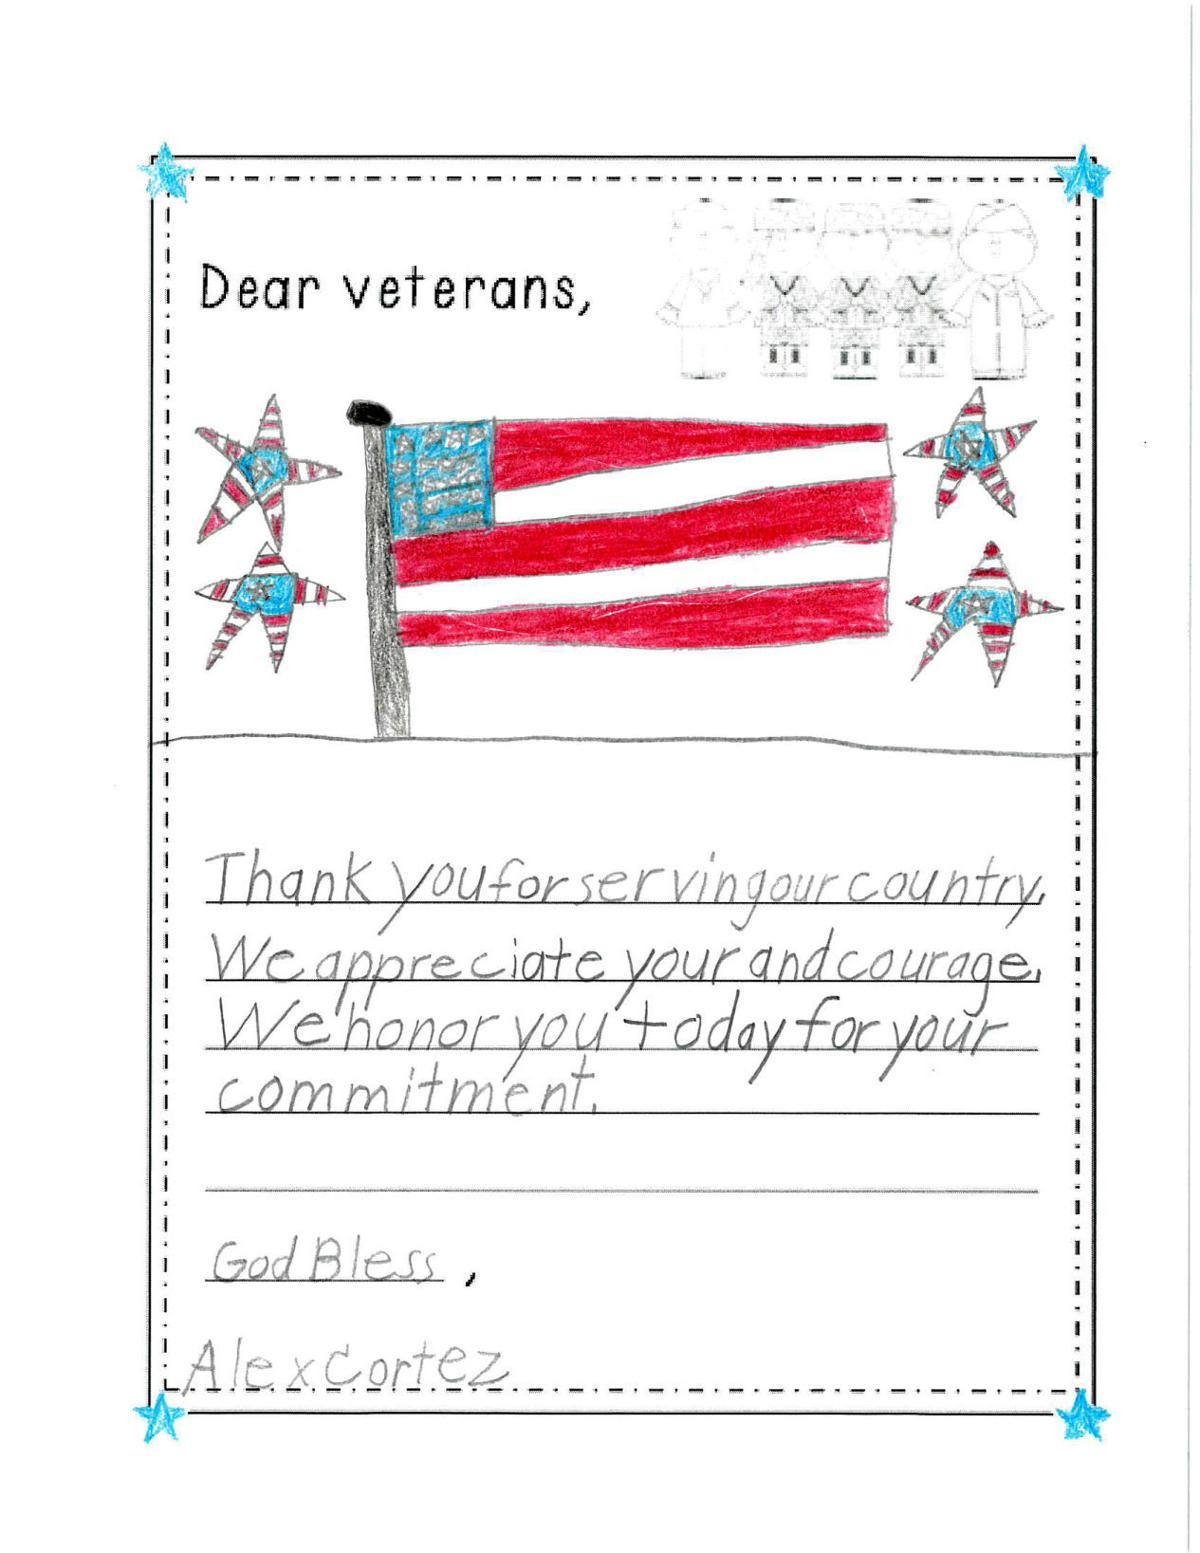 110917 vca veteran letters 02jpg